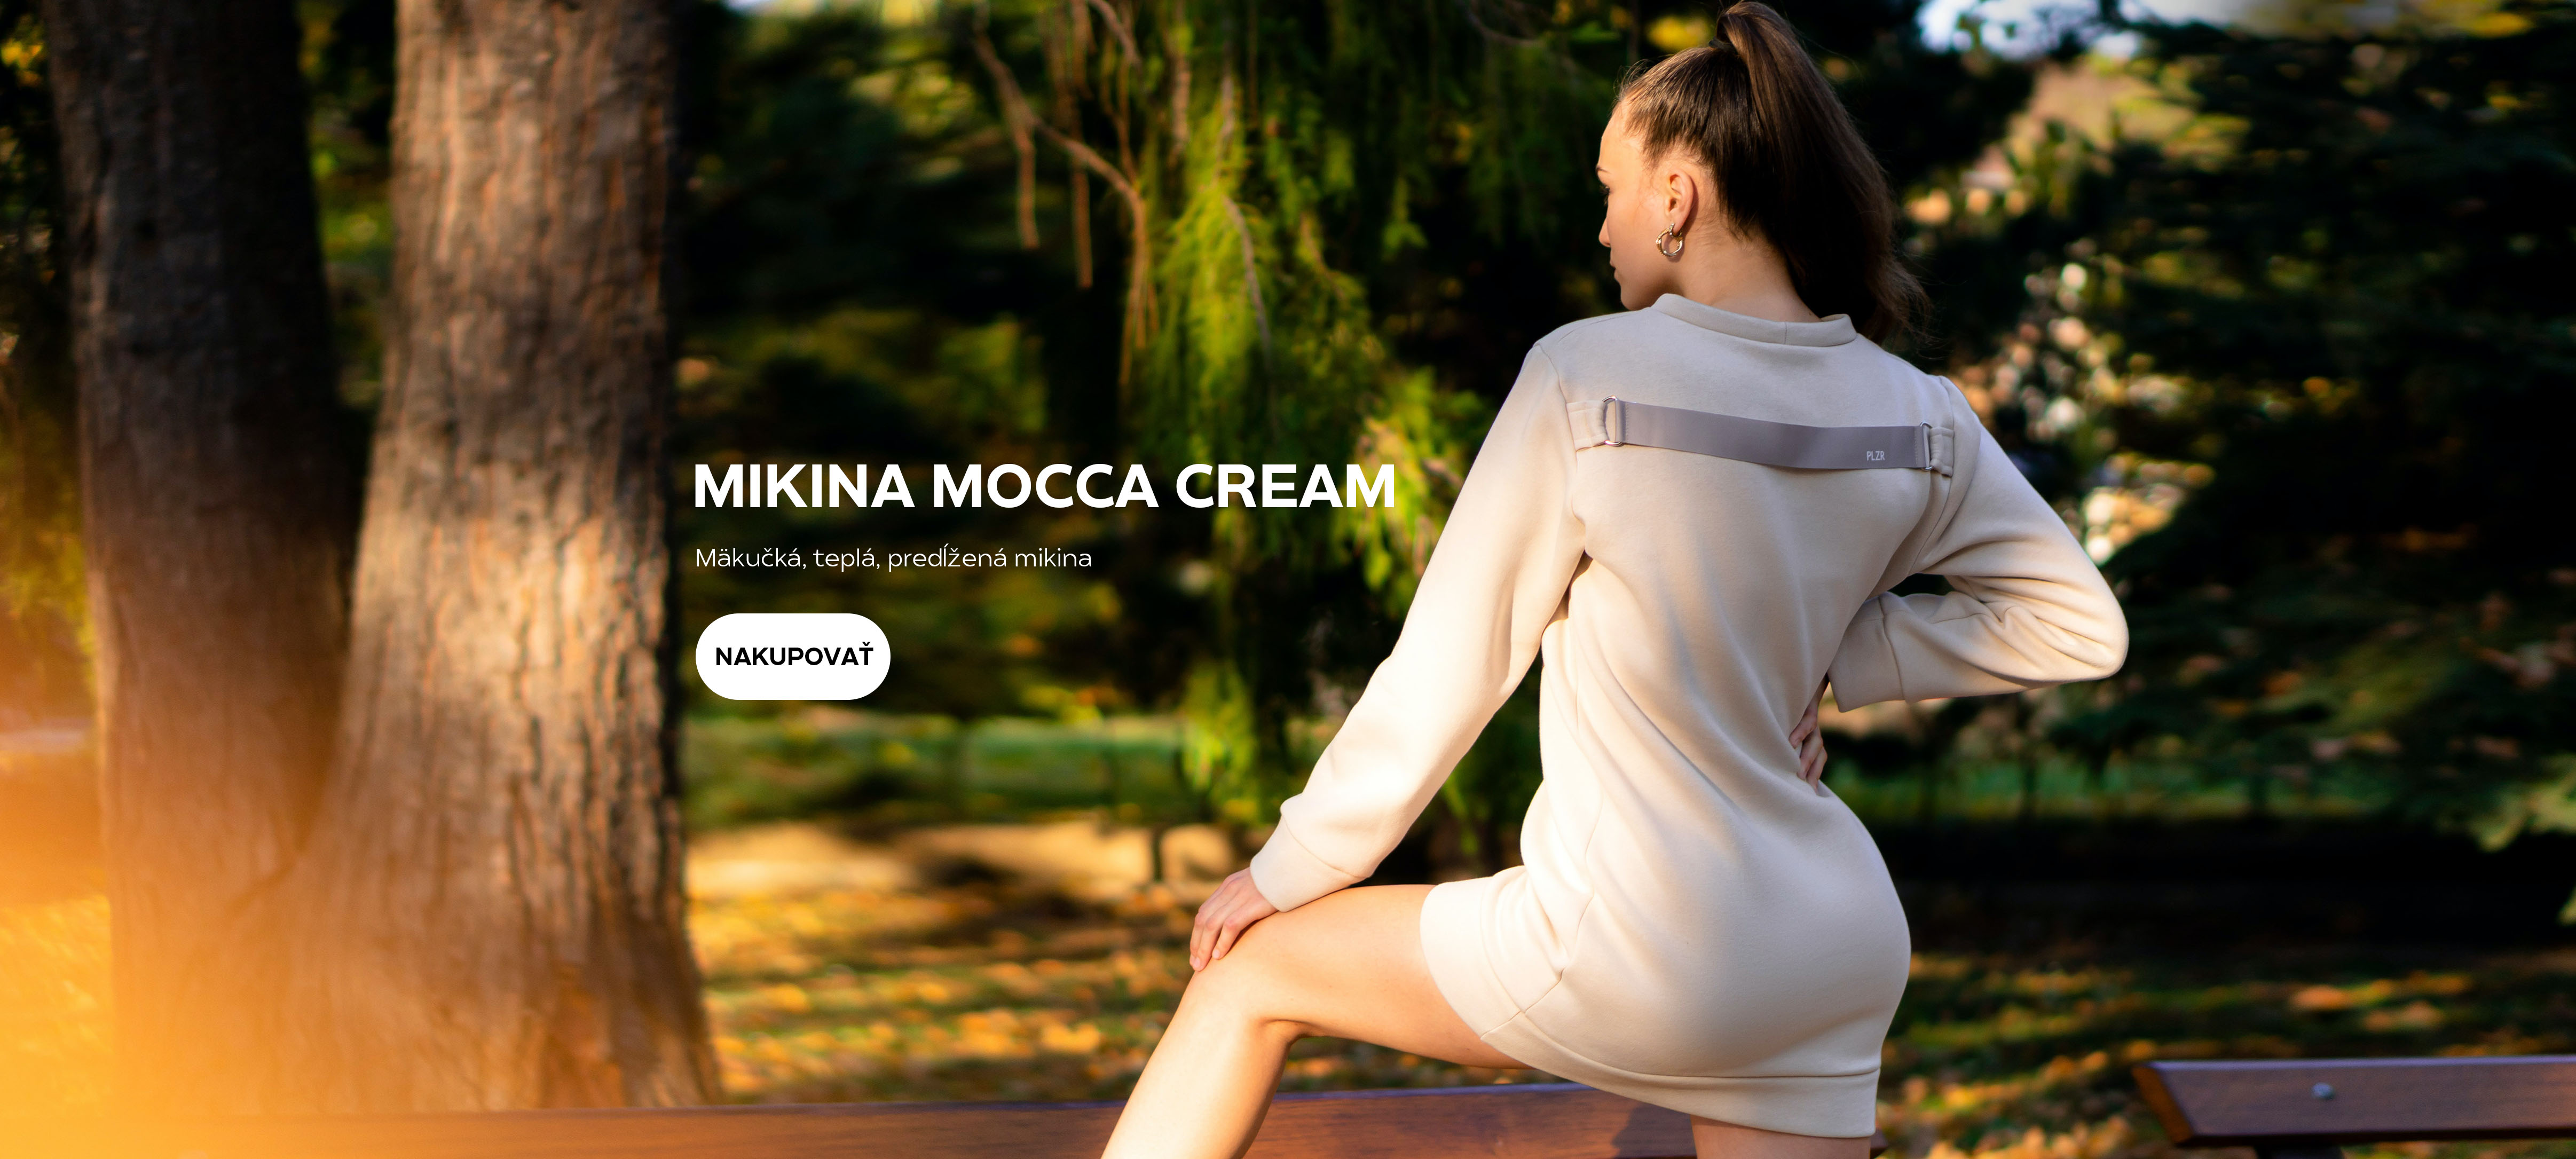 Mikina MOCCA CREAM